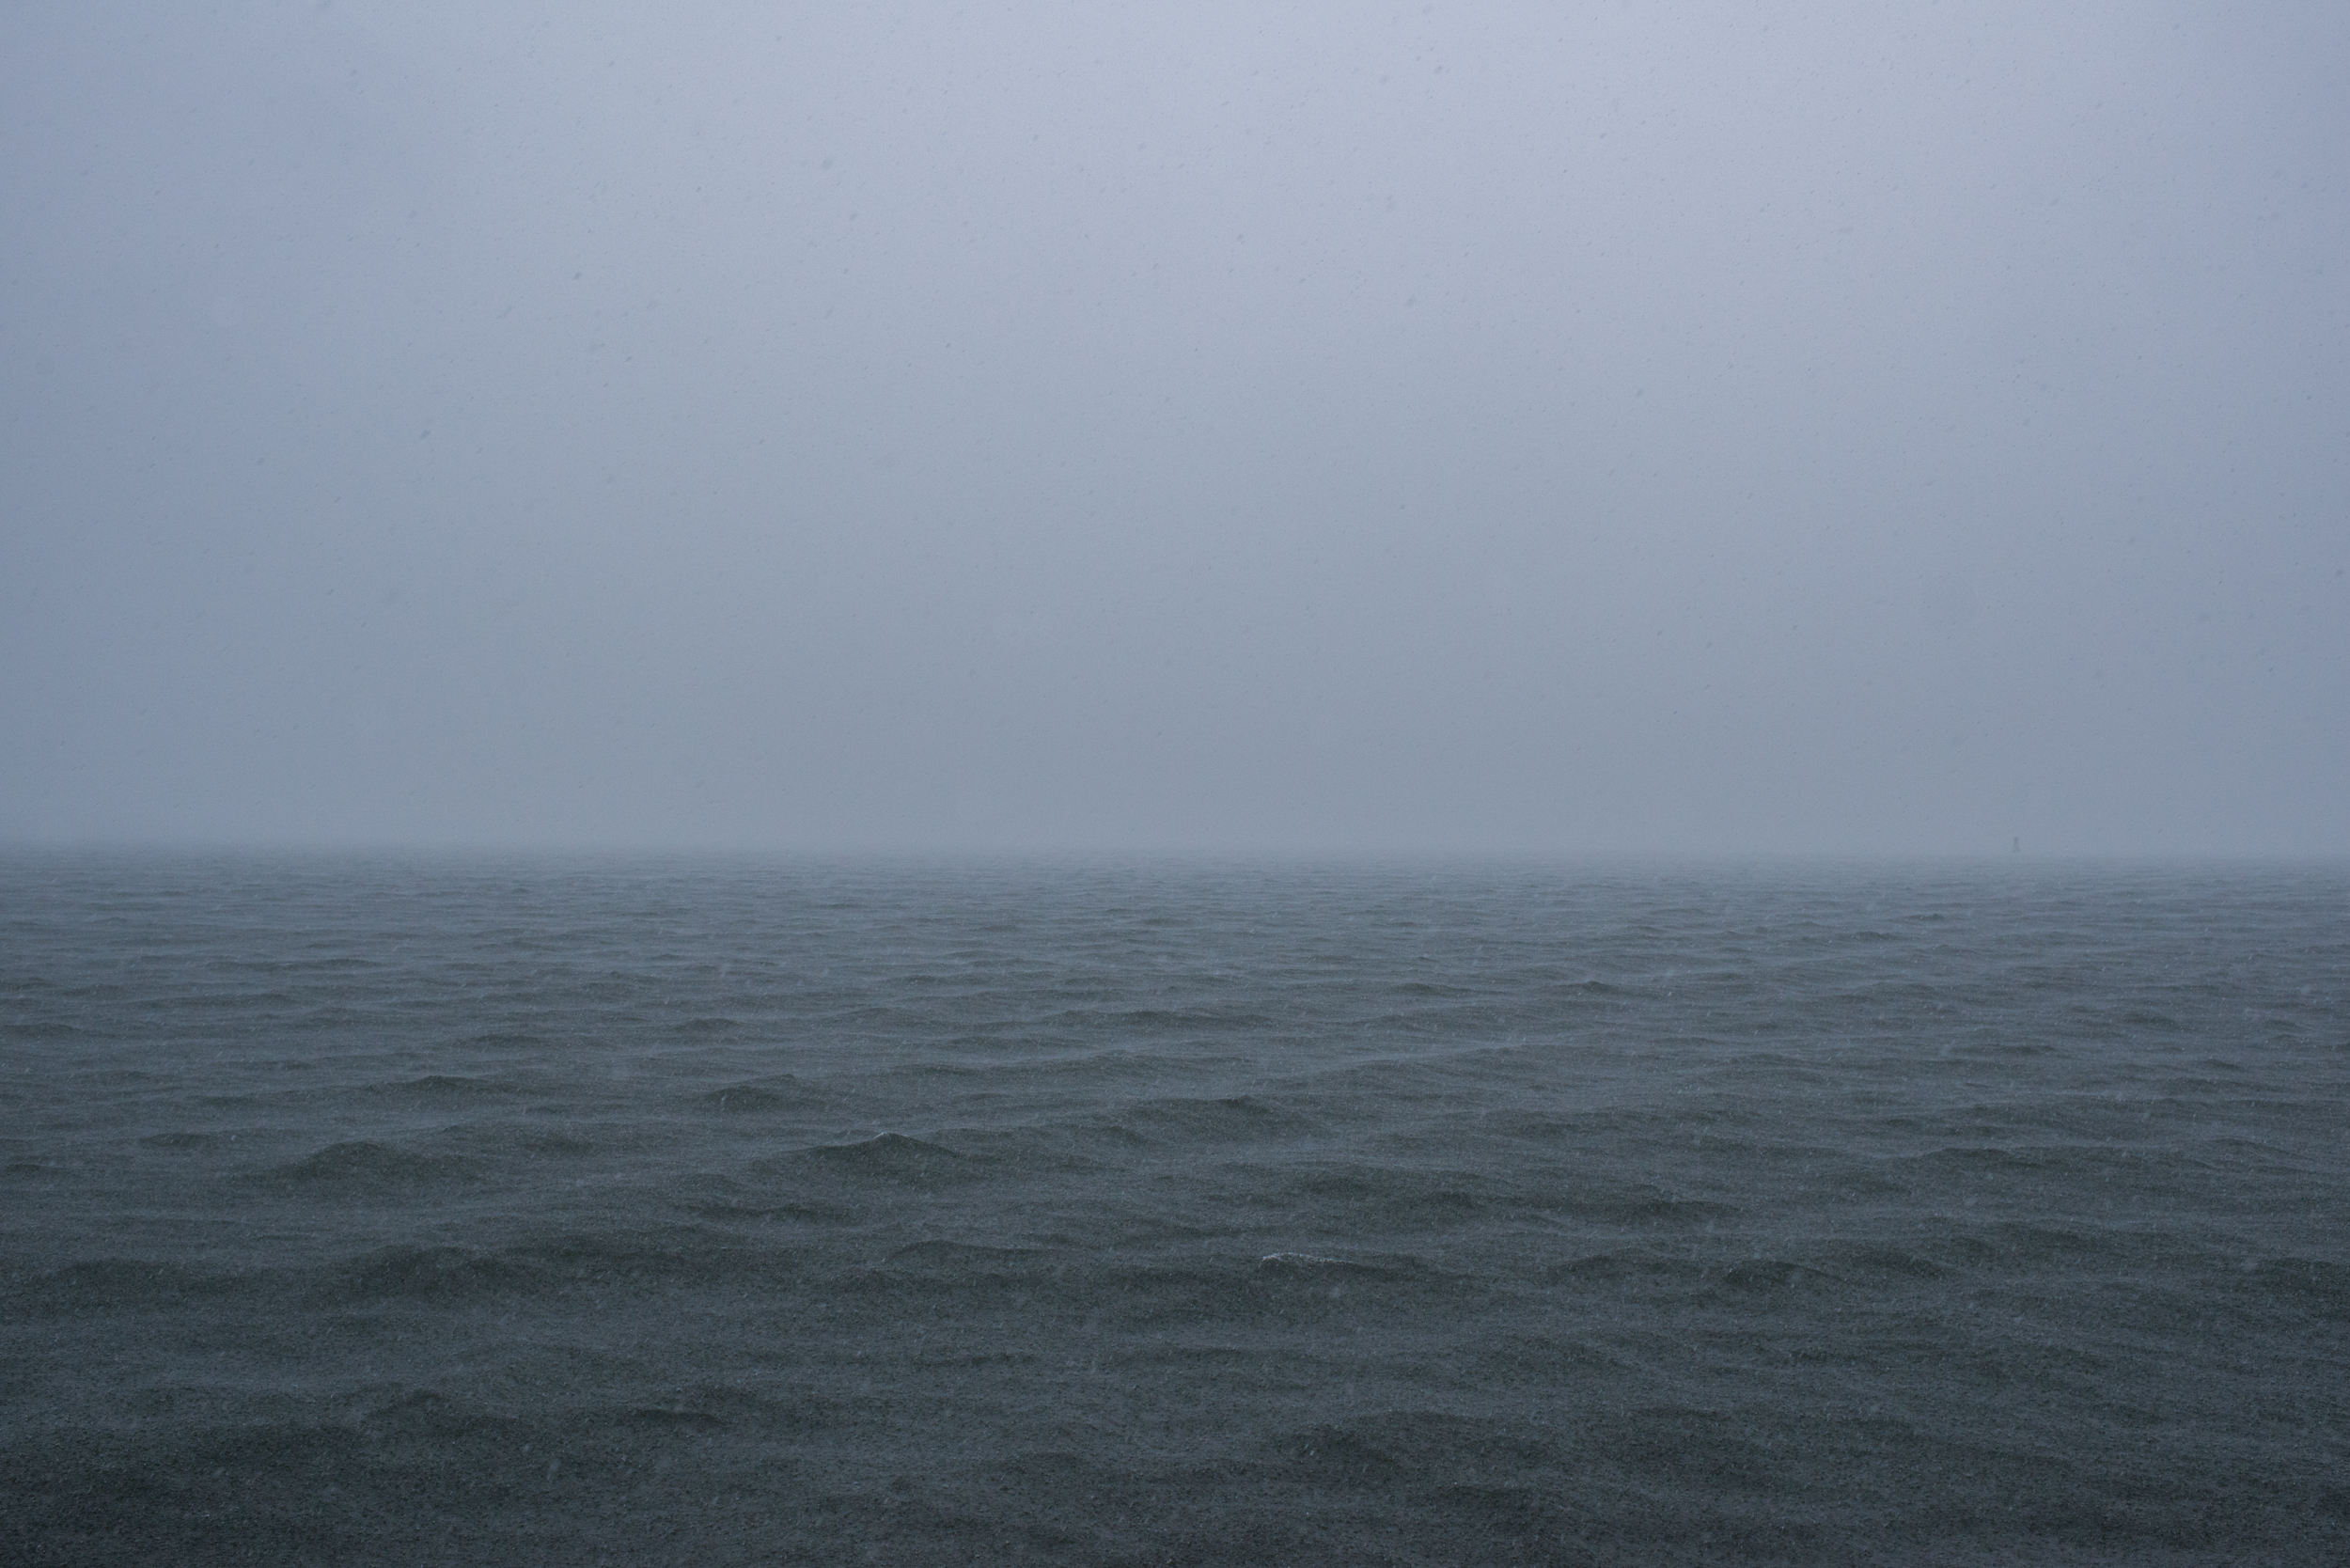 14_VIC_170707_Ferry_Rainy_140.jpg